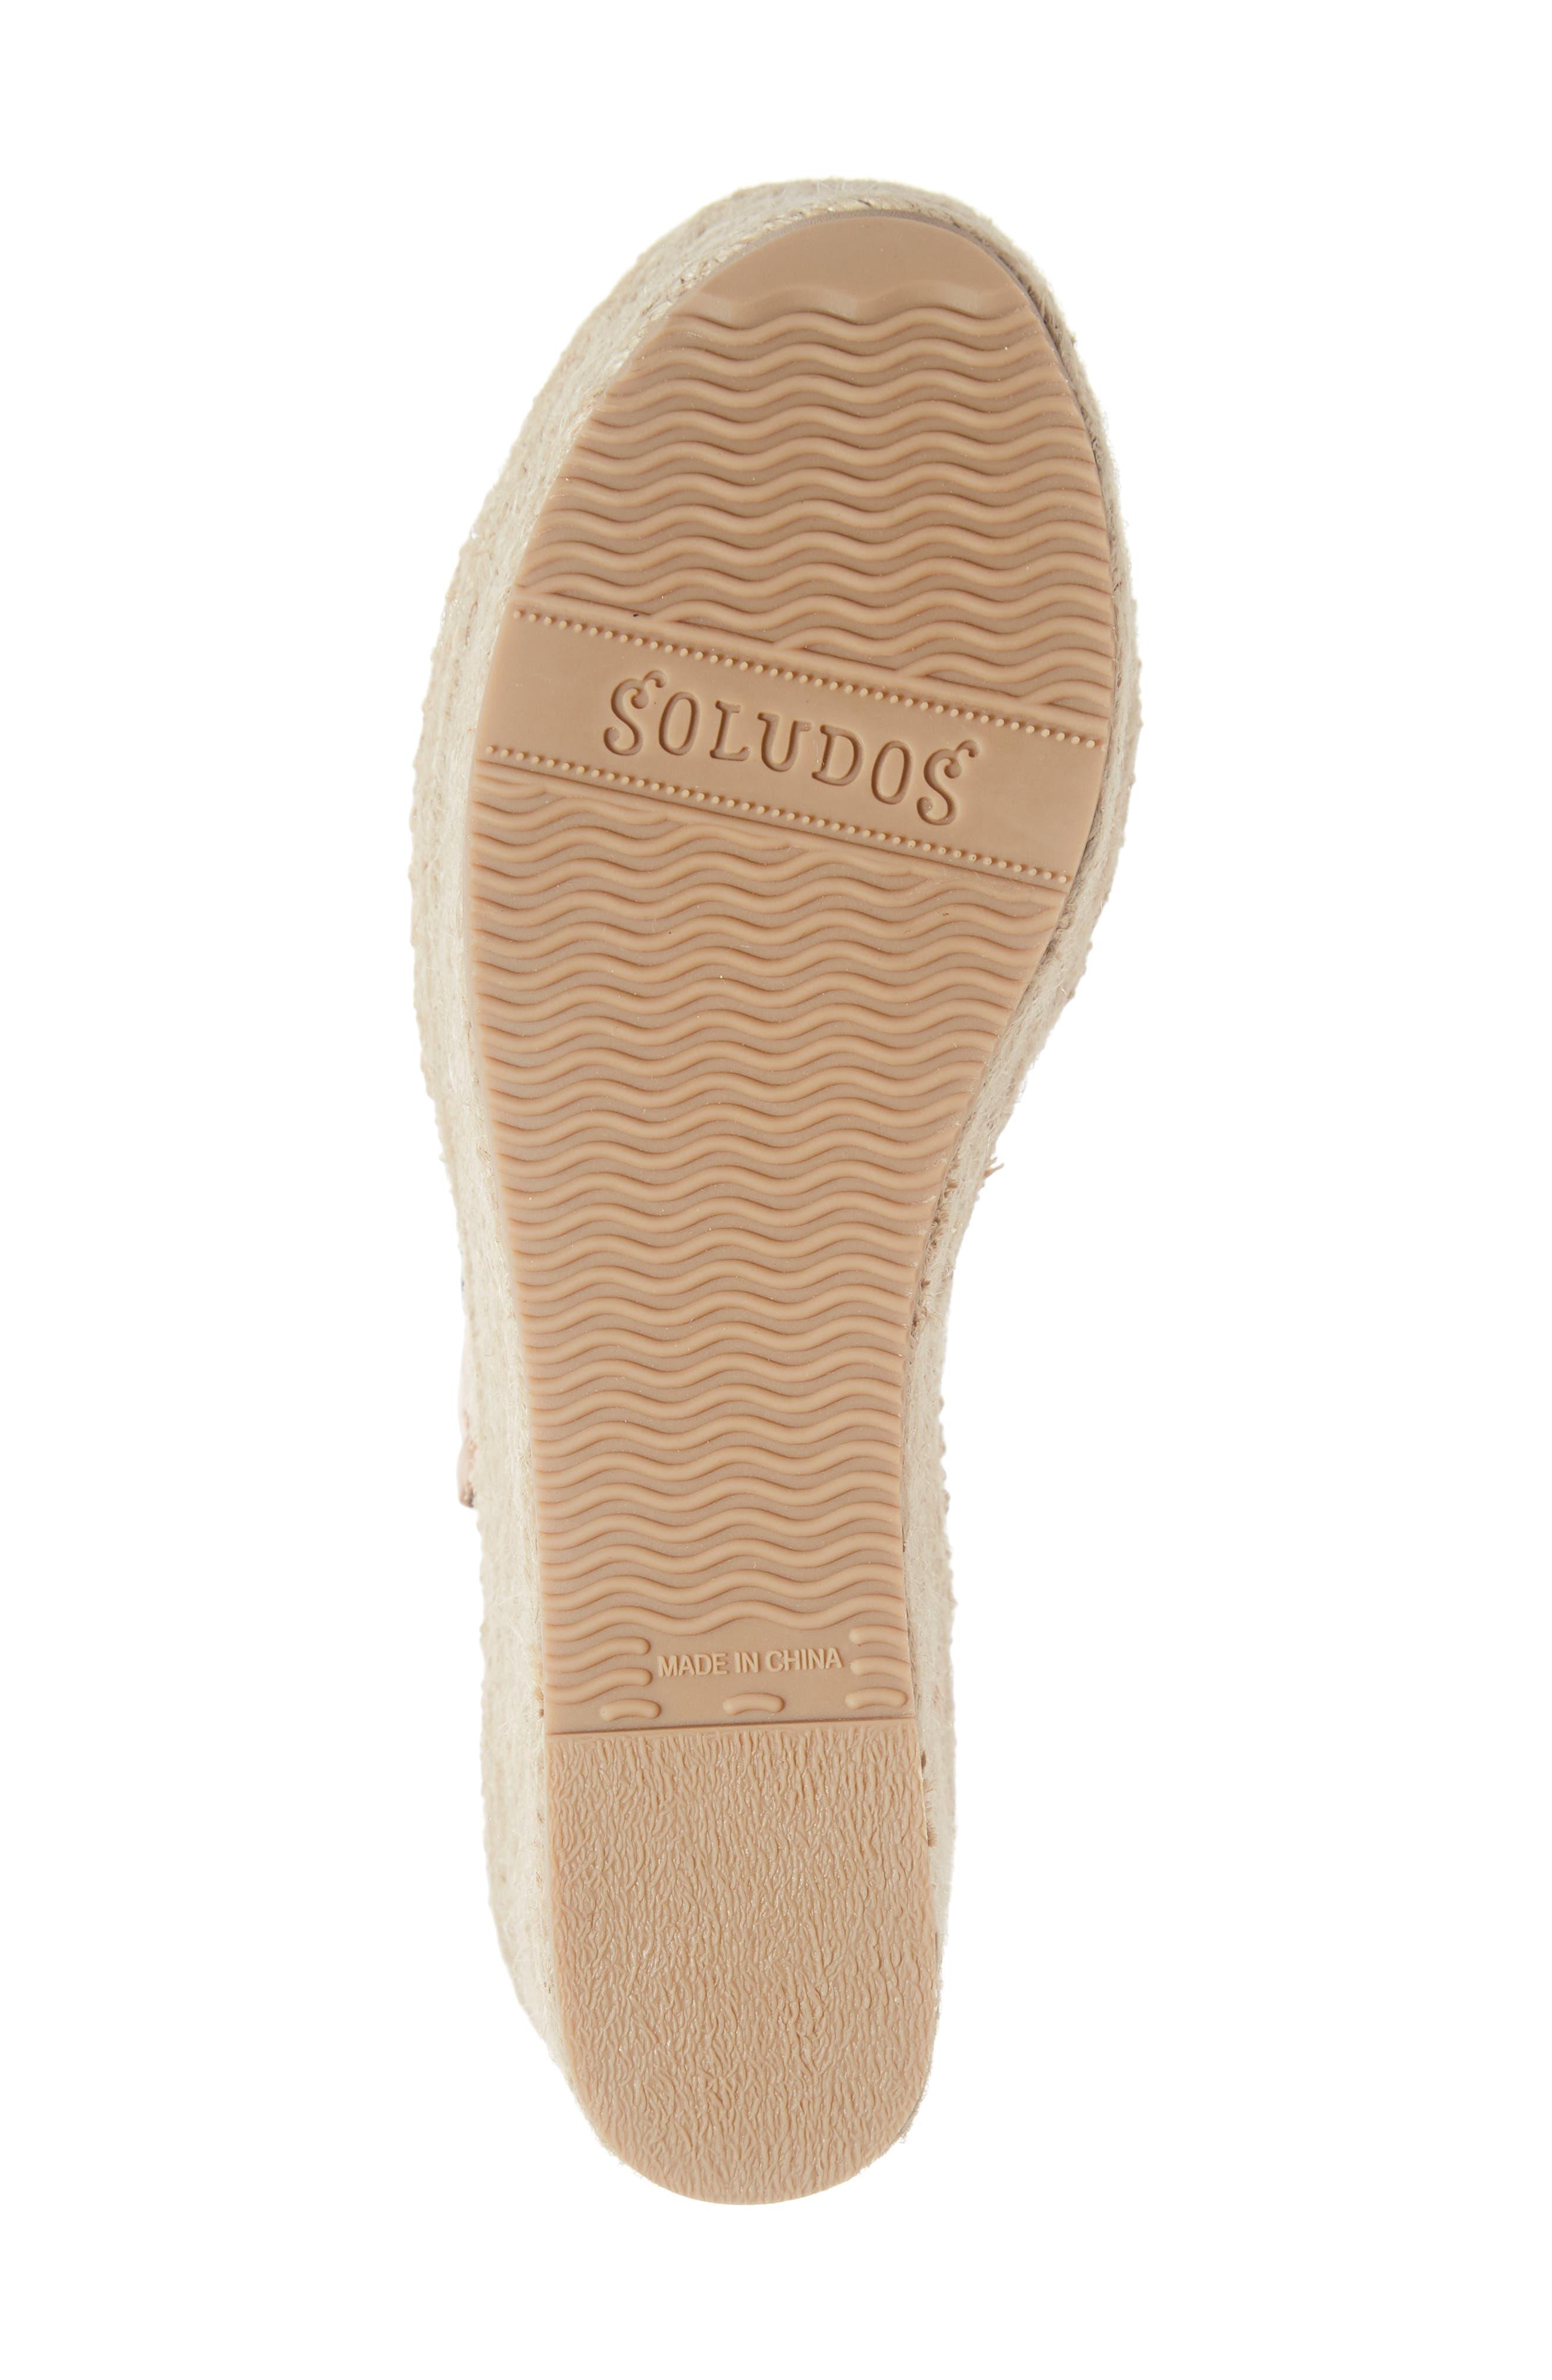 SOLUDOS, Minorca Platform Wedge Sandal, Alternate thumbnail 6, color, NUDE LEATHER